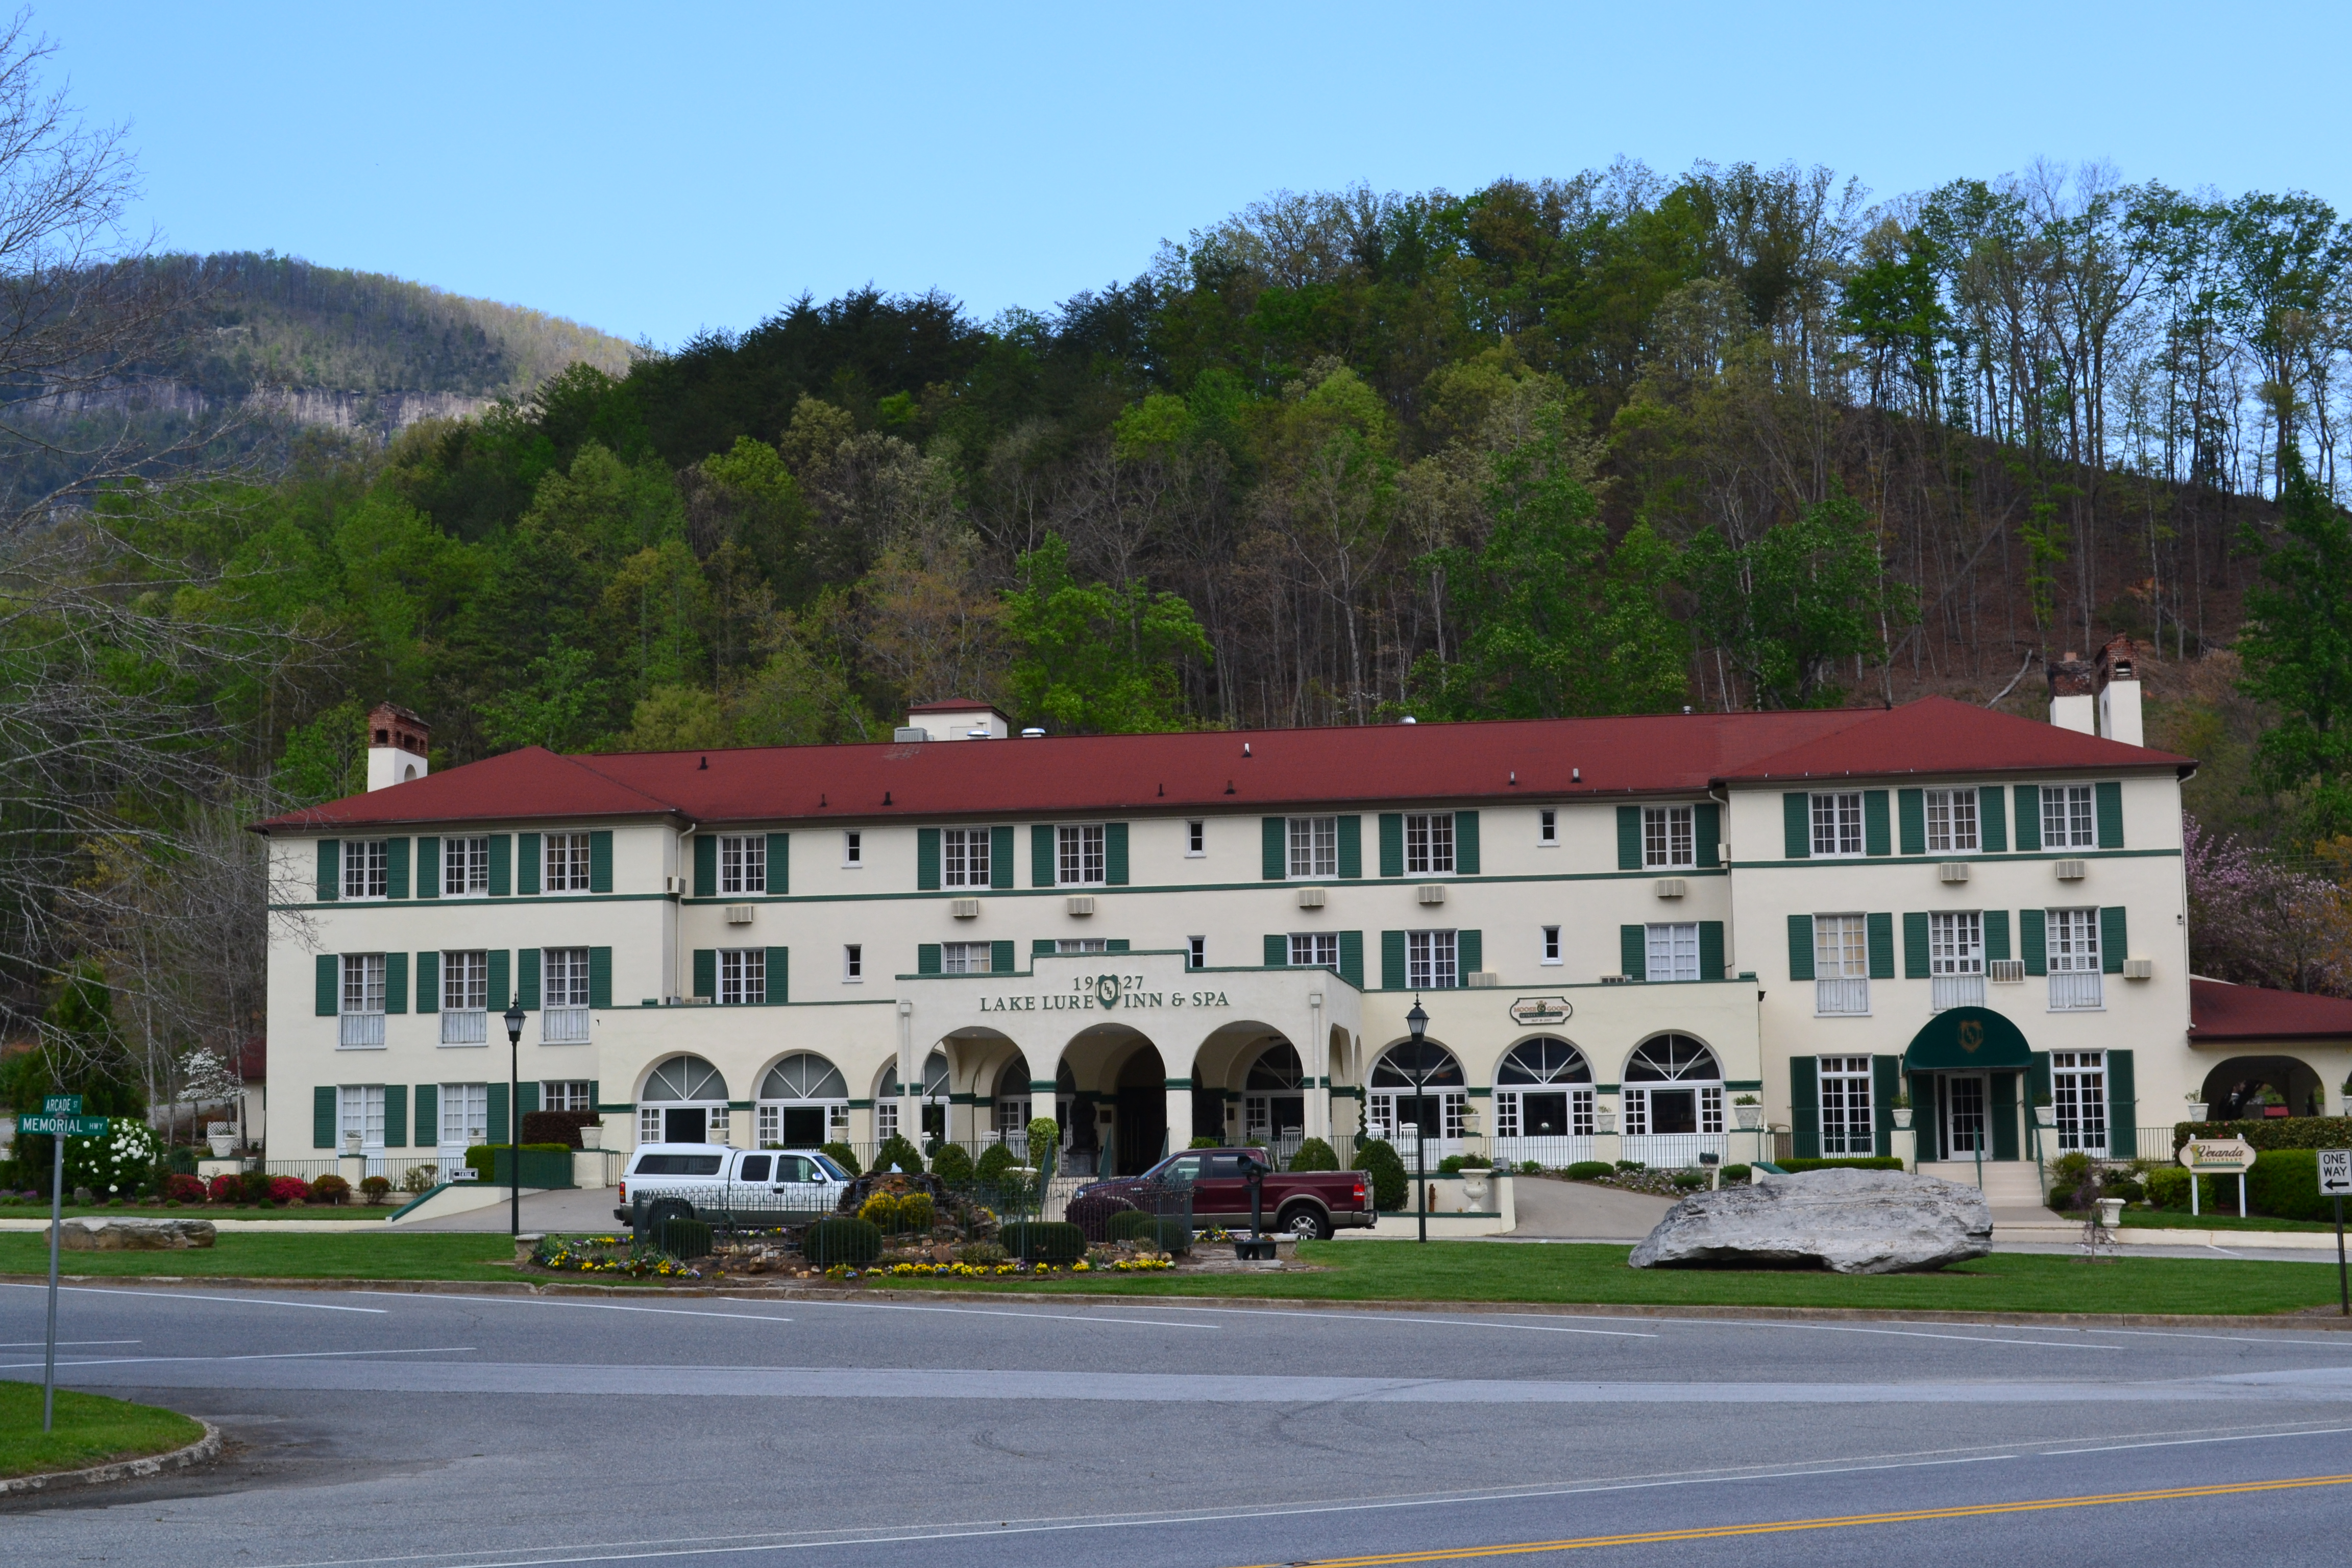 Lake Lure Inn North Carolina ghosts haunted